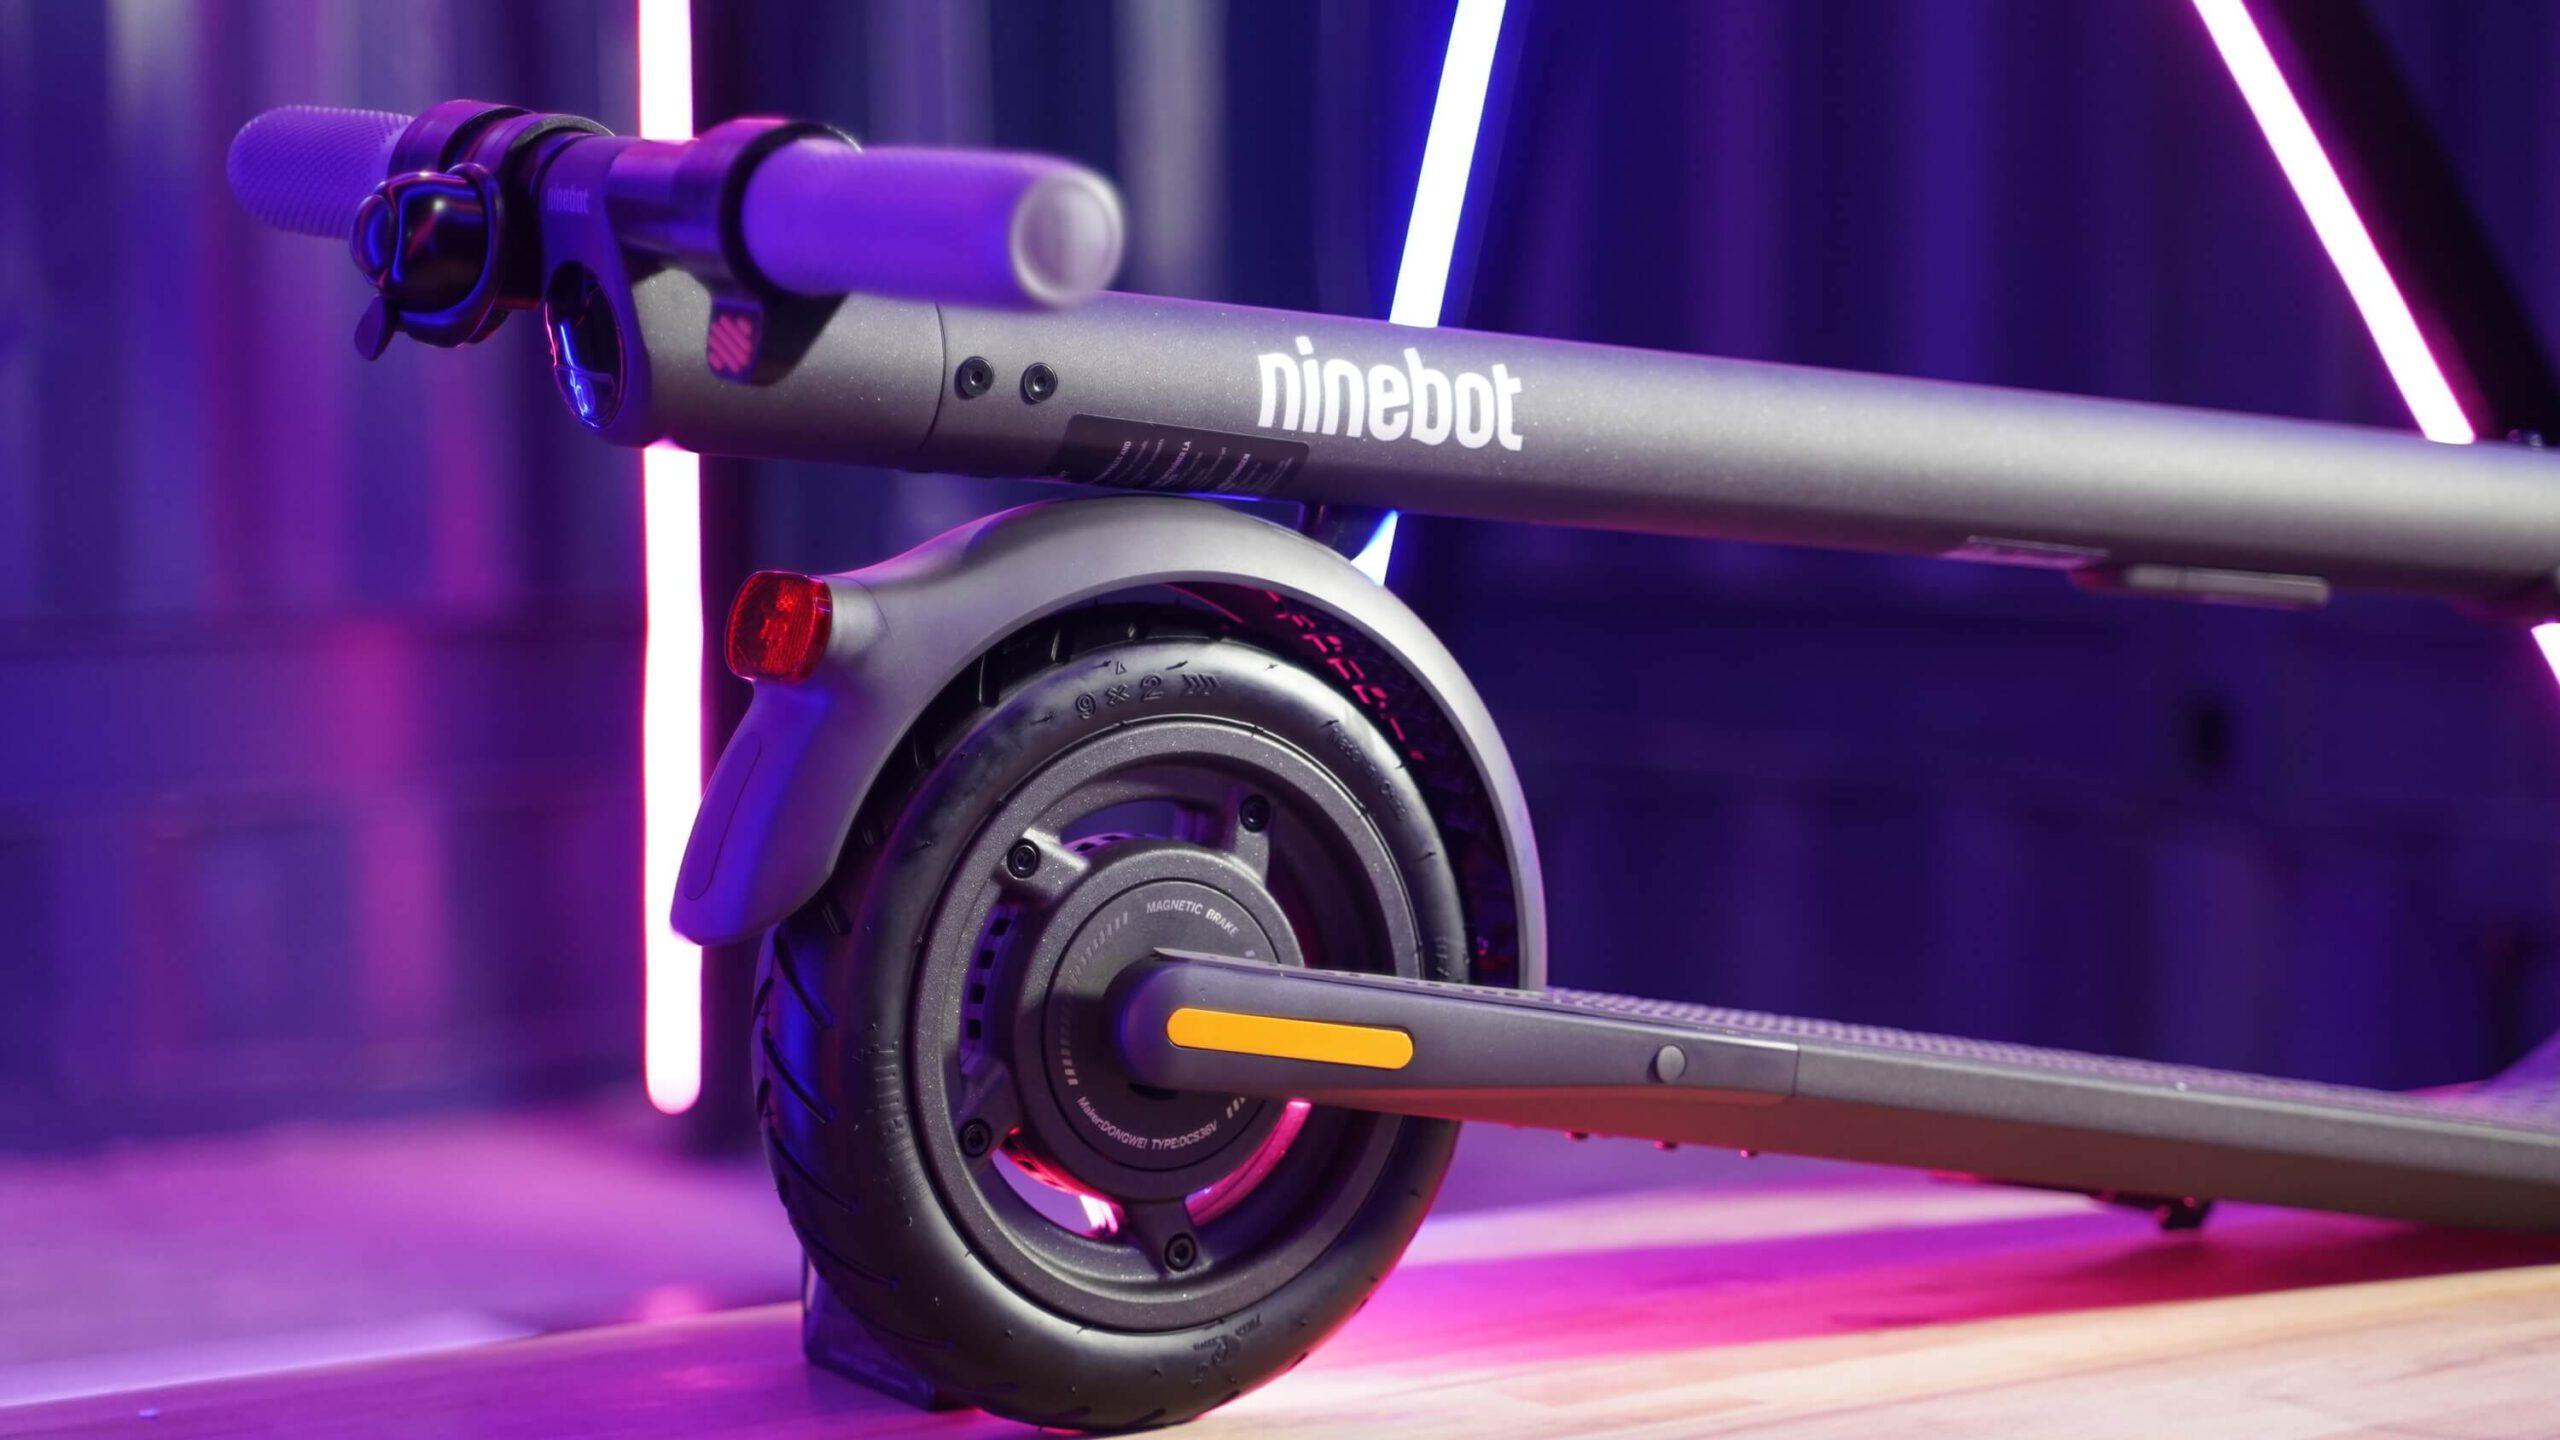 ninebot kickscooter e25-รุ่นใหม่ล่าสุด